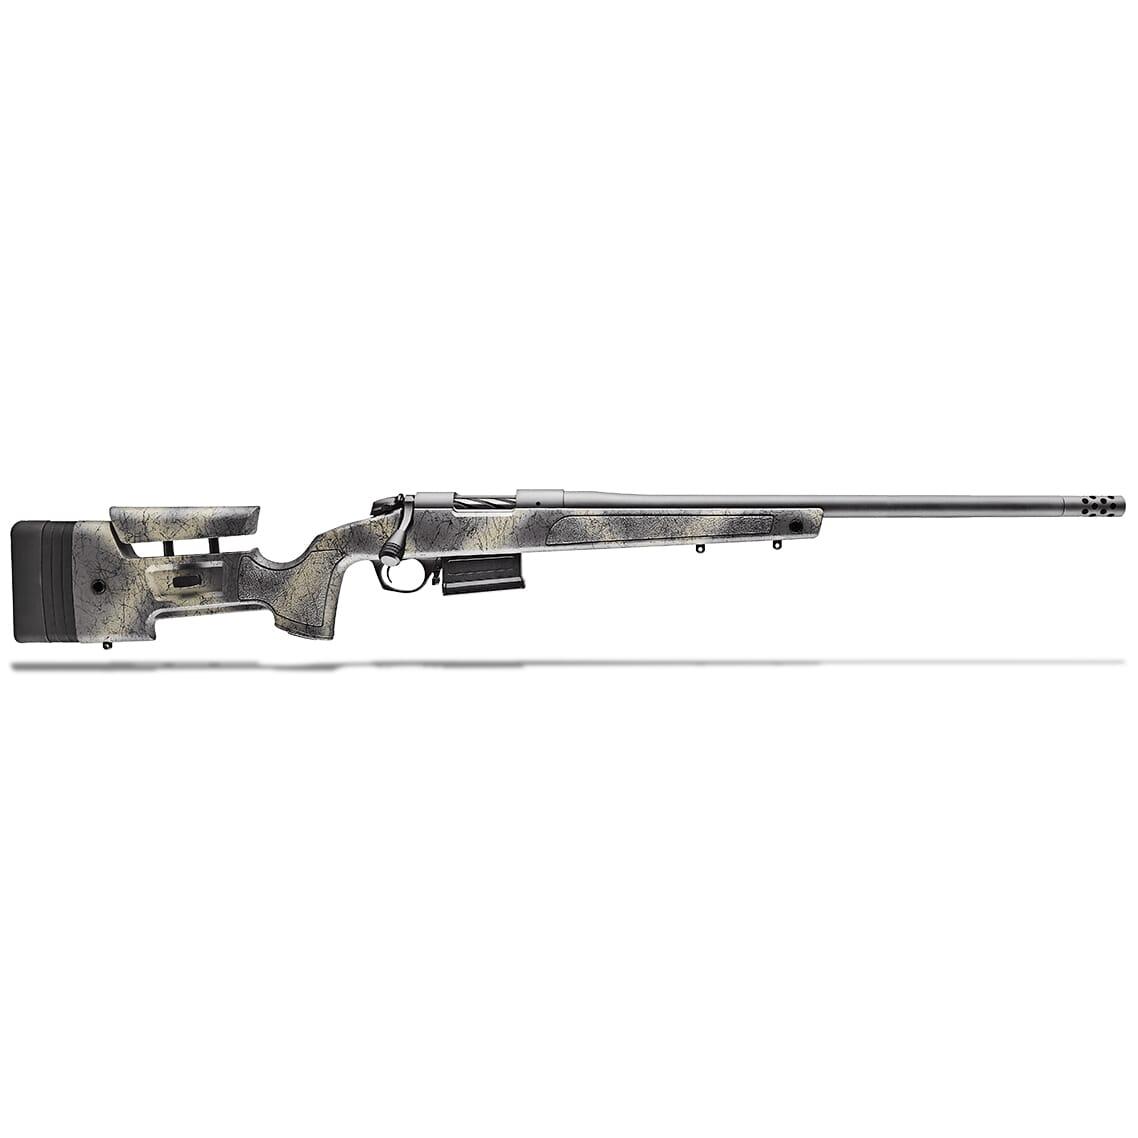 "Bergara B-14 HMR ""Wilderness"" .308 Win Molded Mini-Chassis Stock 20"" Rifle w/ Muzzlebrake B14S371"